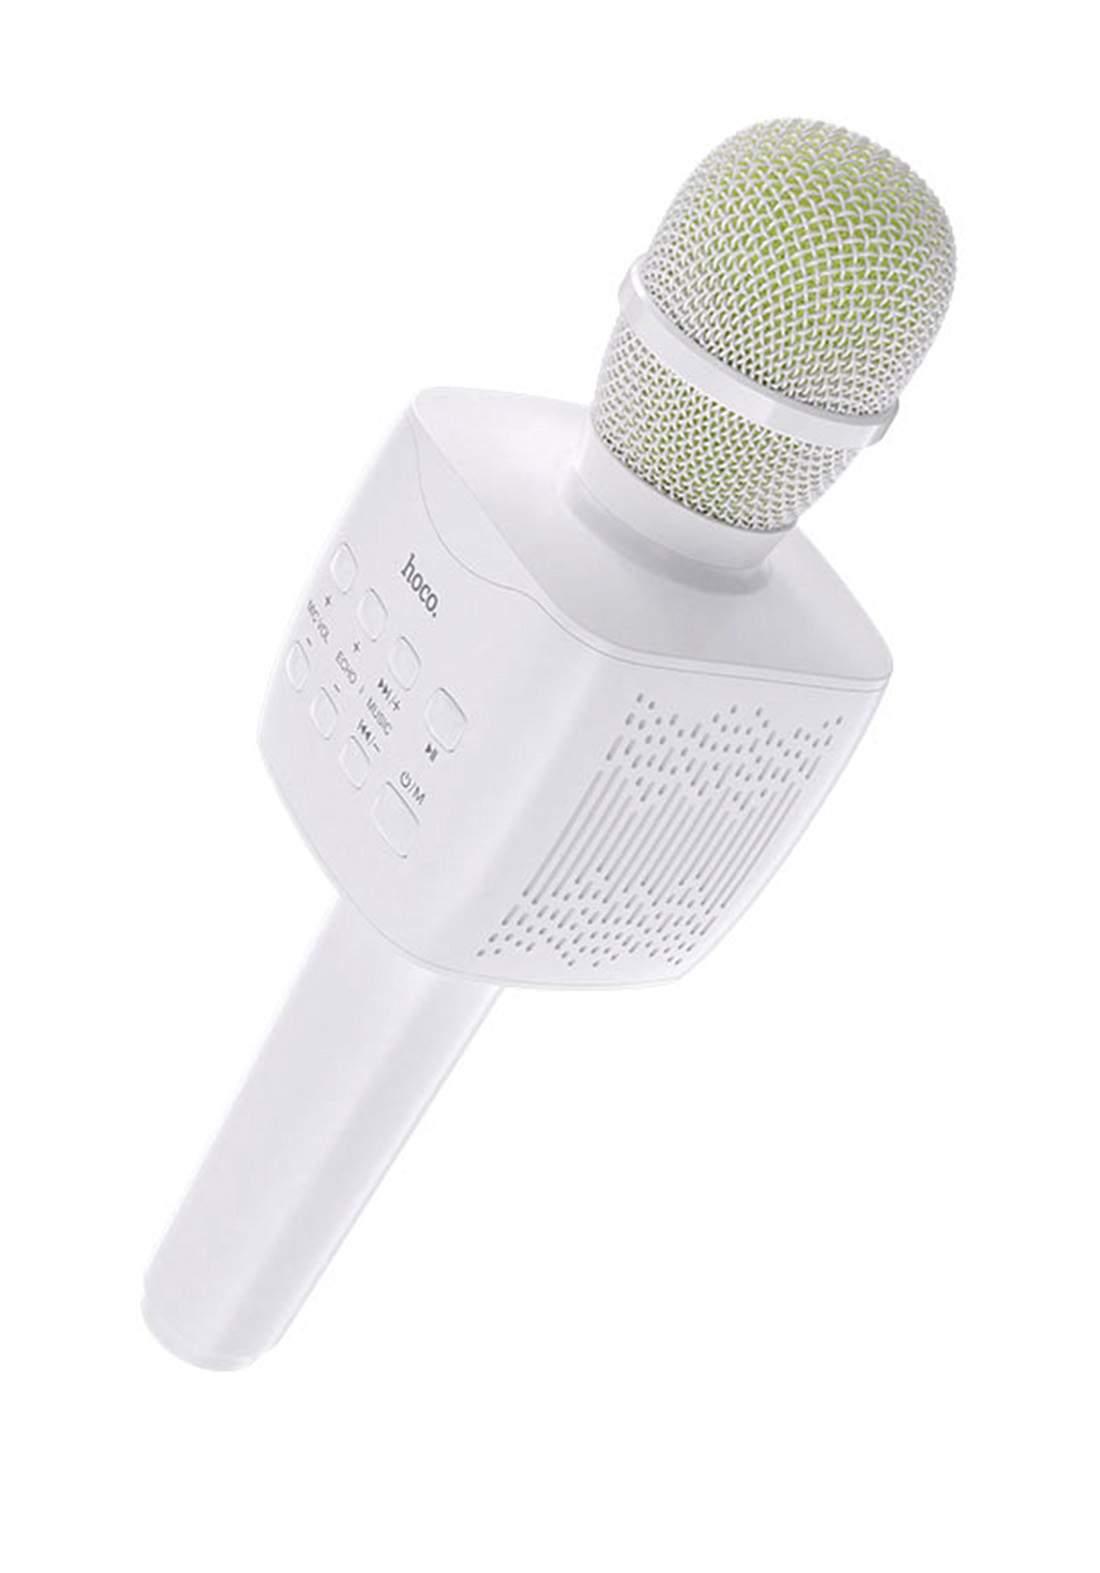 Hoco BK5 Wireless Karaoke Microphone